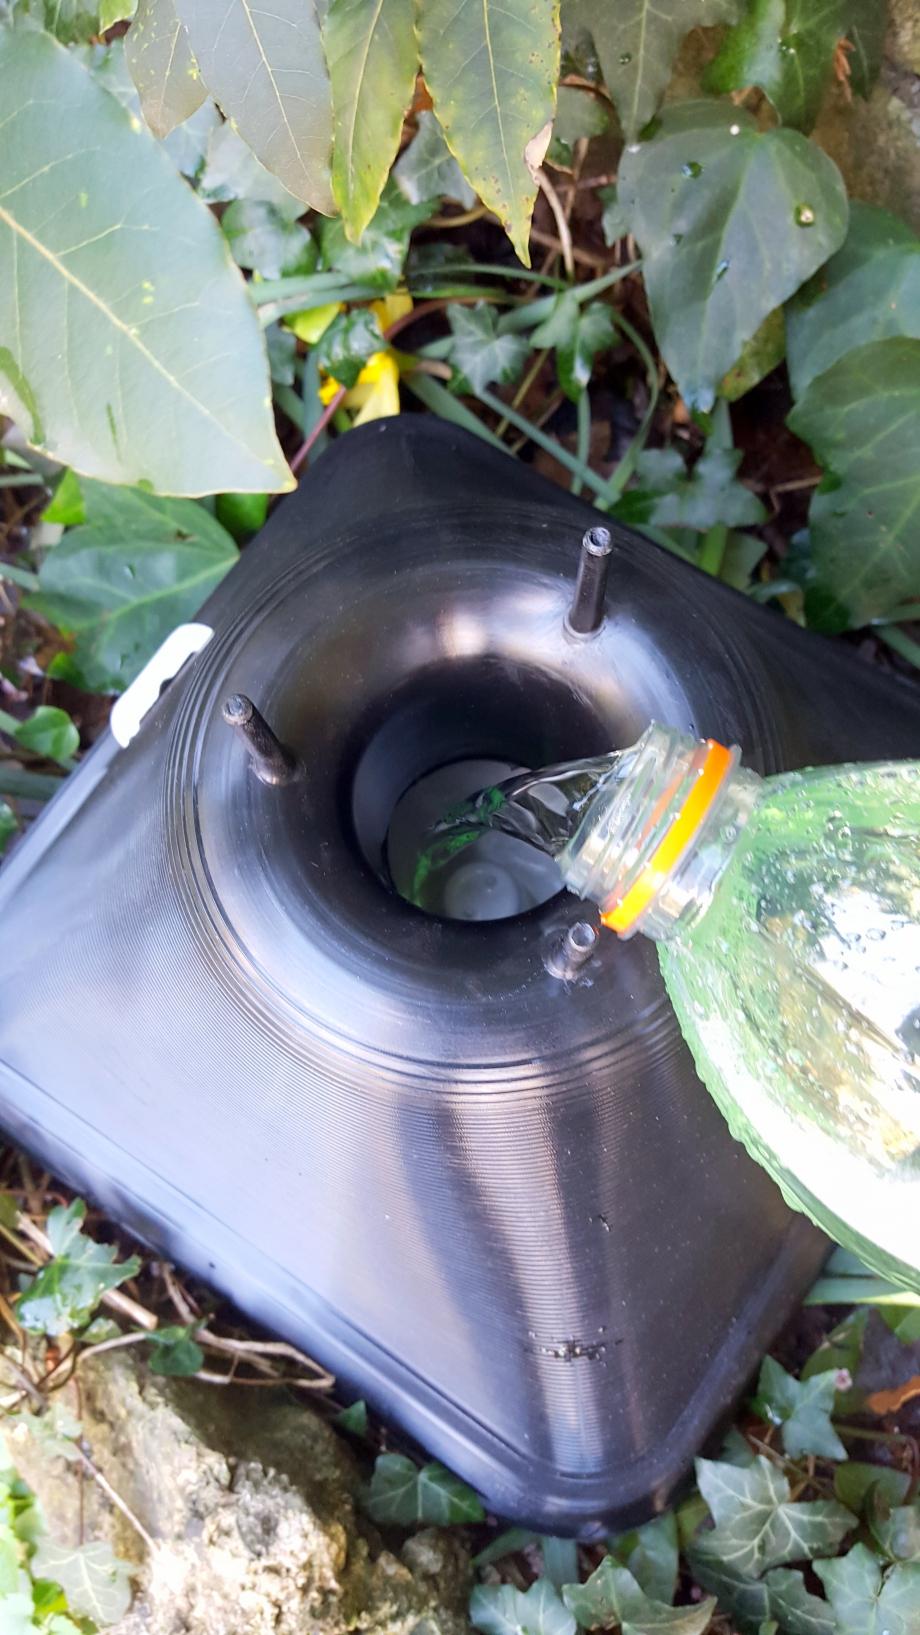 Introduction liquide vaisselle 5 mars 16.jpg